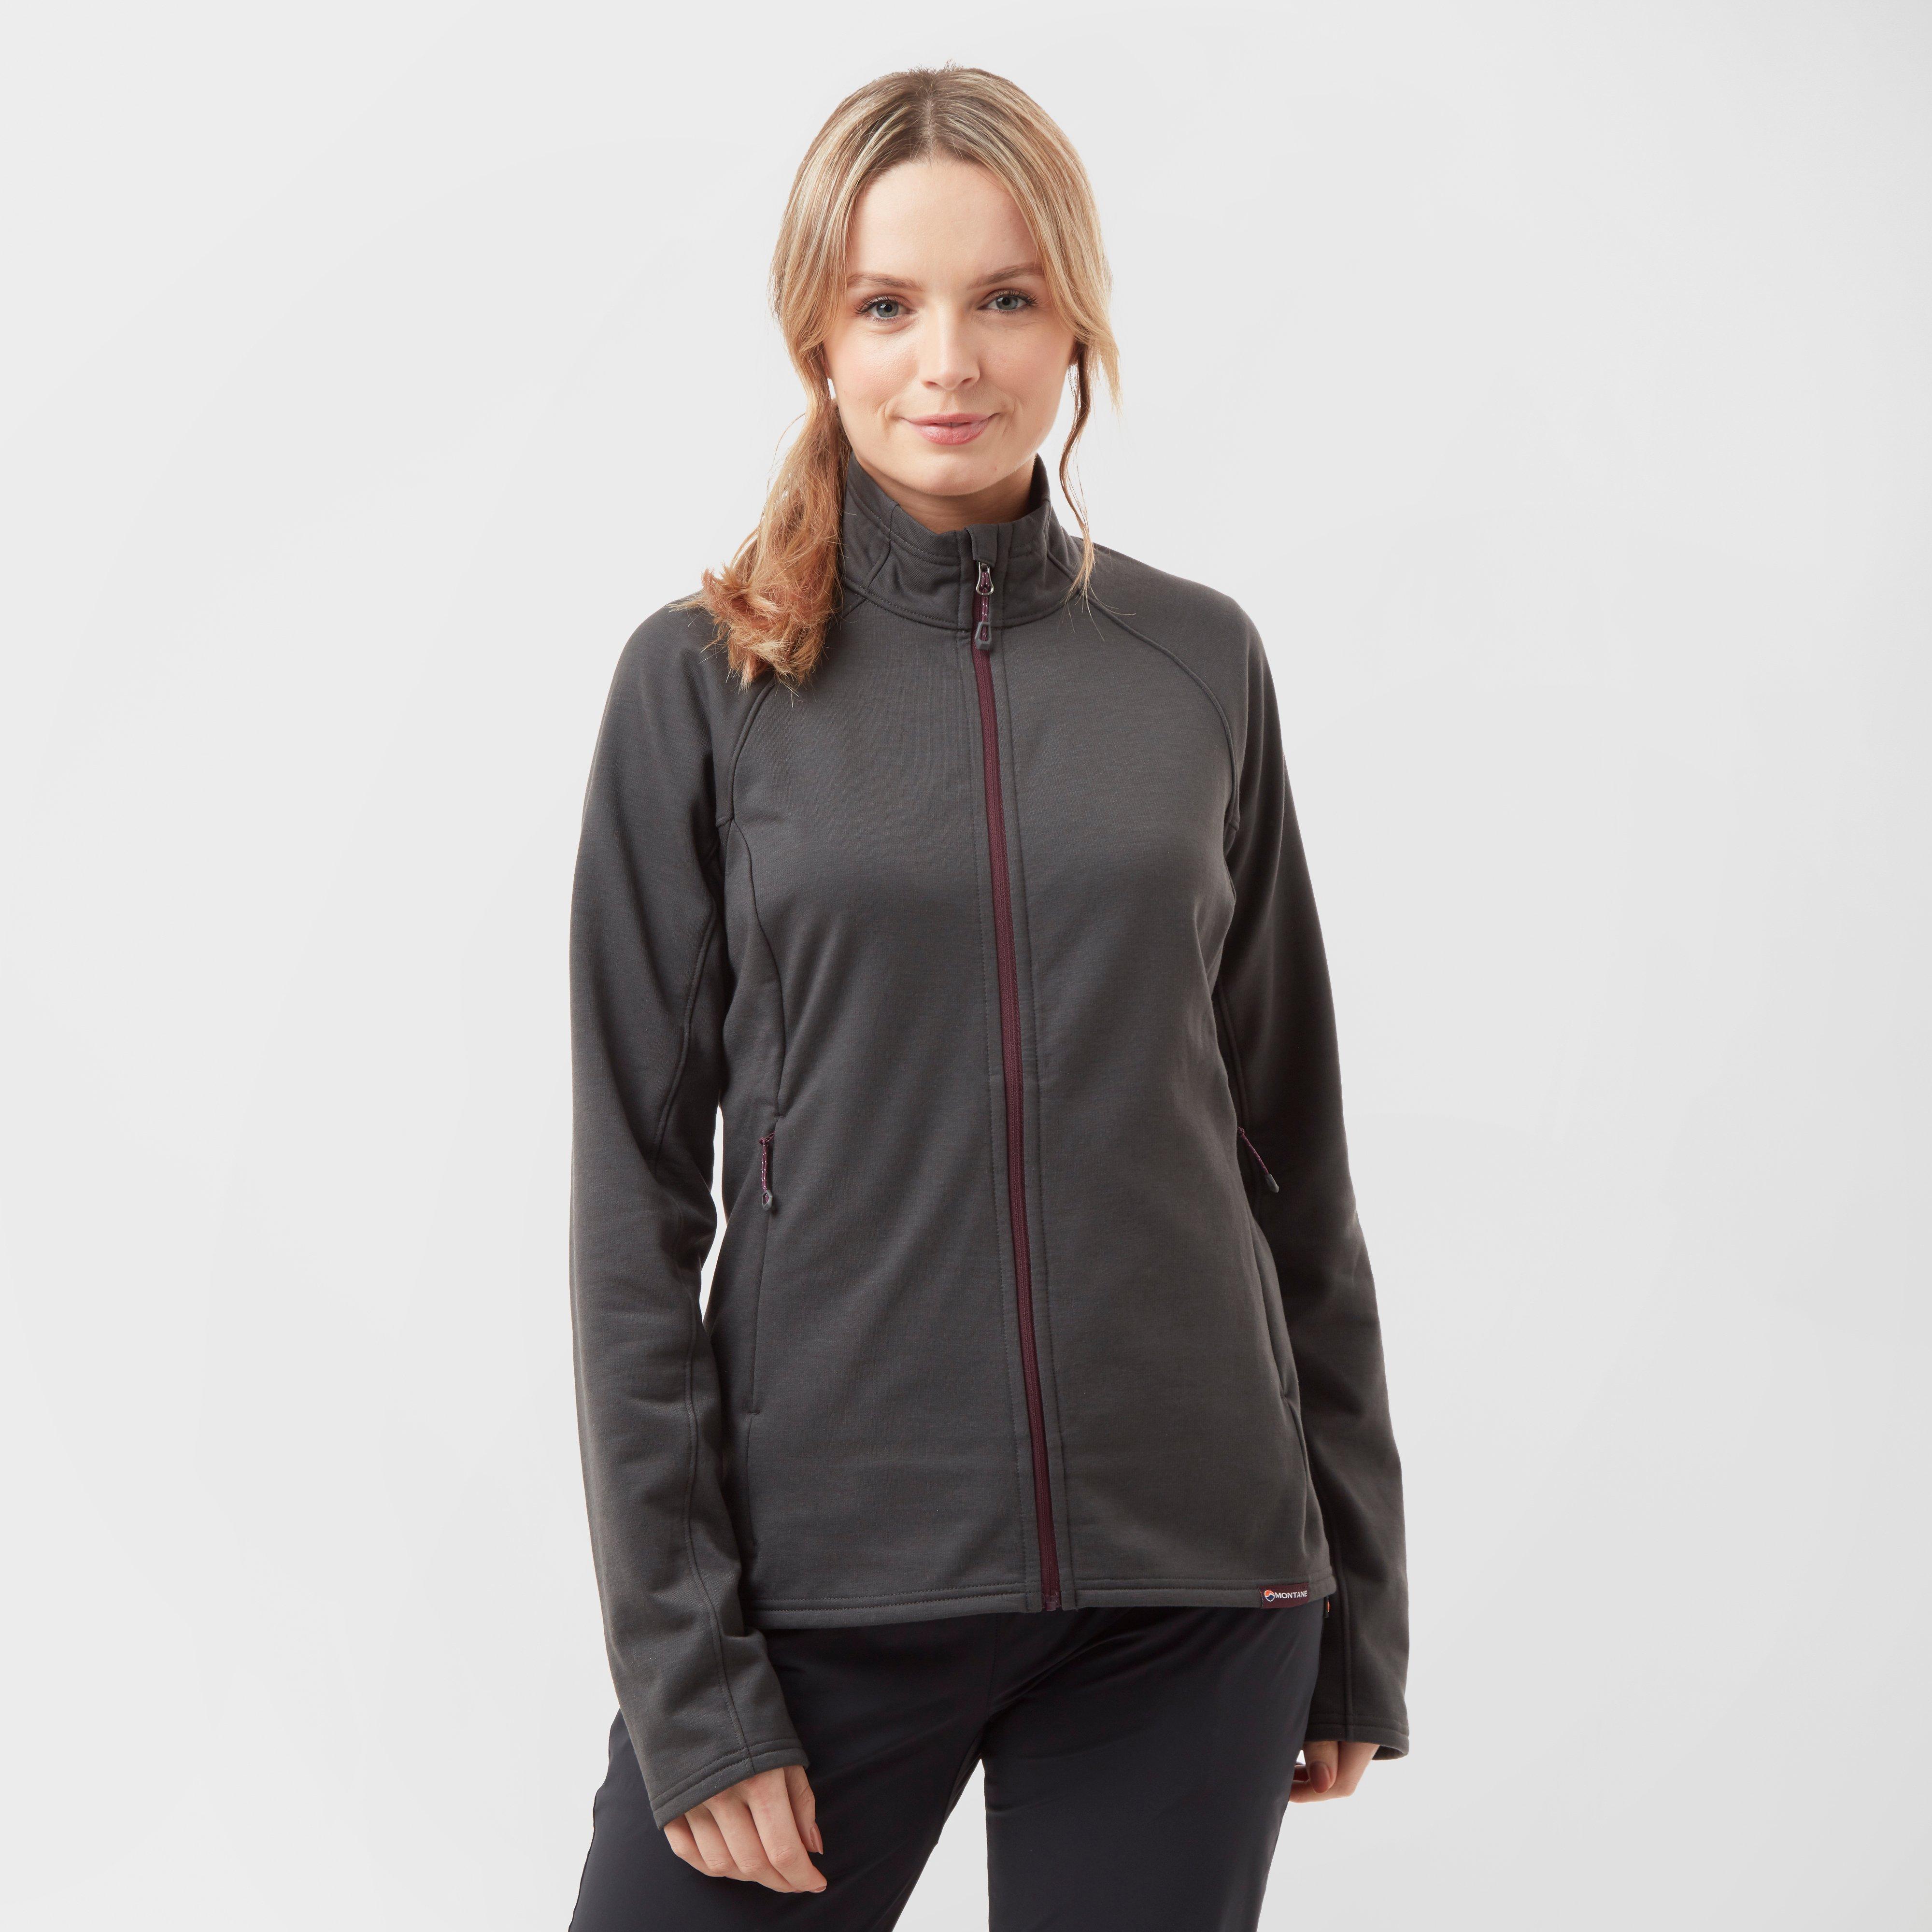 Montane Women's Bellatrix Fleece Jacket, Grey